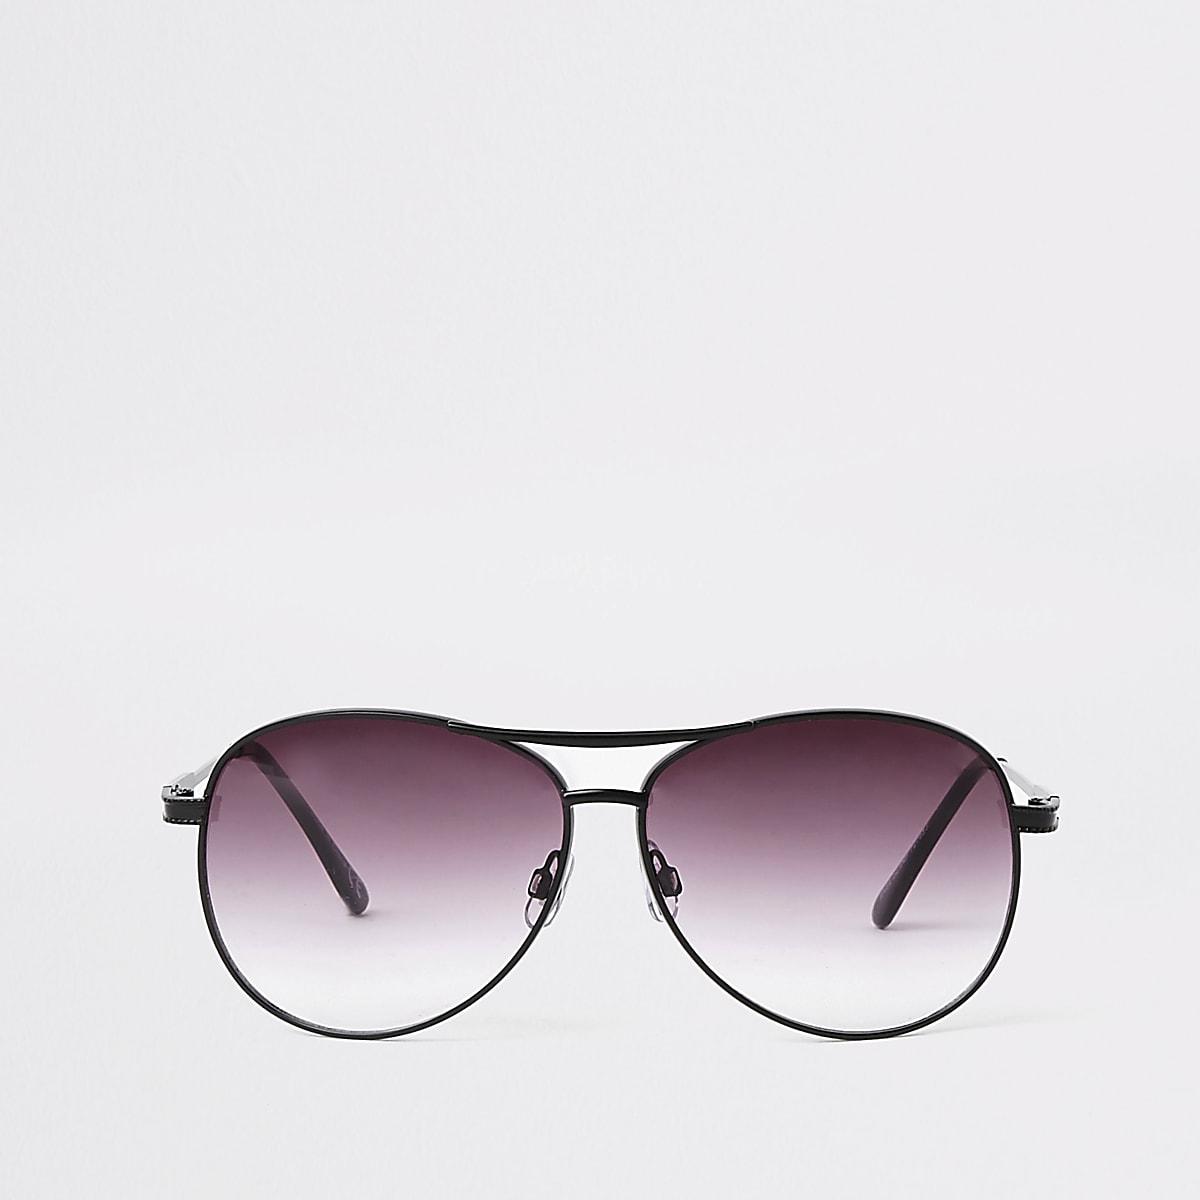 86c4d2cdf5 Black purple lens aviator sunglasses - Aviator Sunglasses - Sunglasses -  women